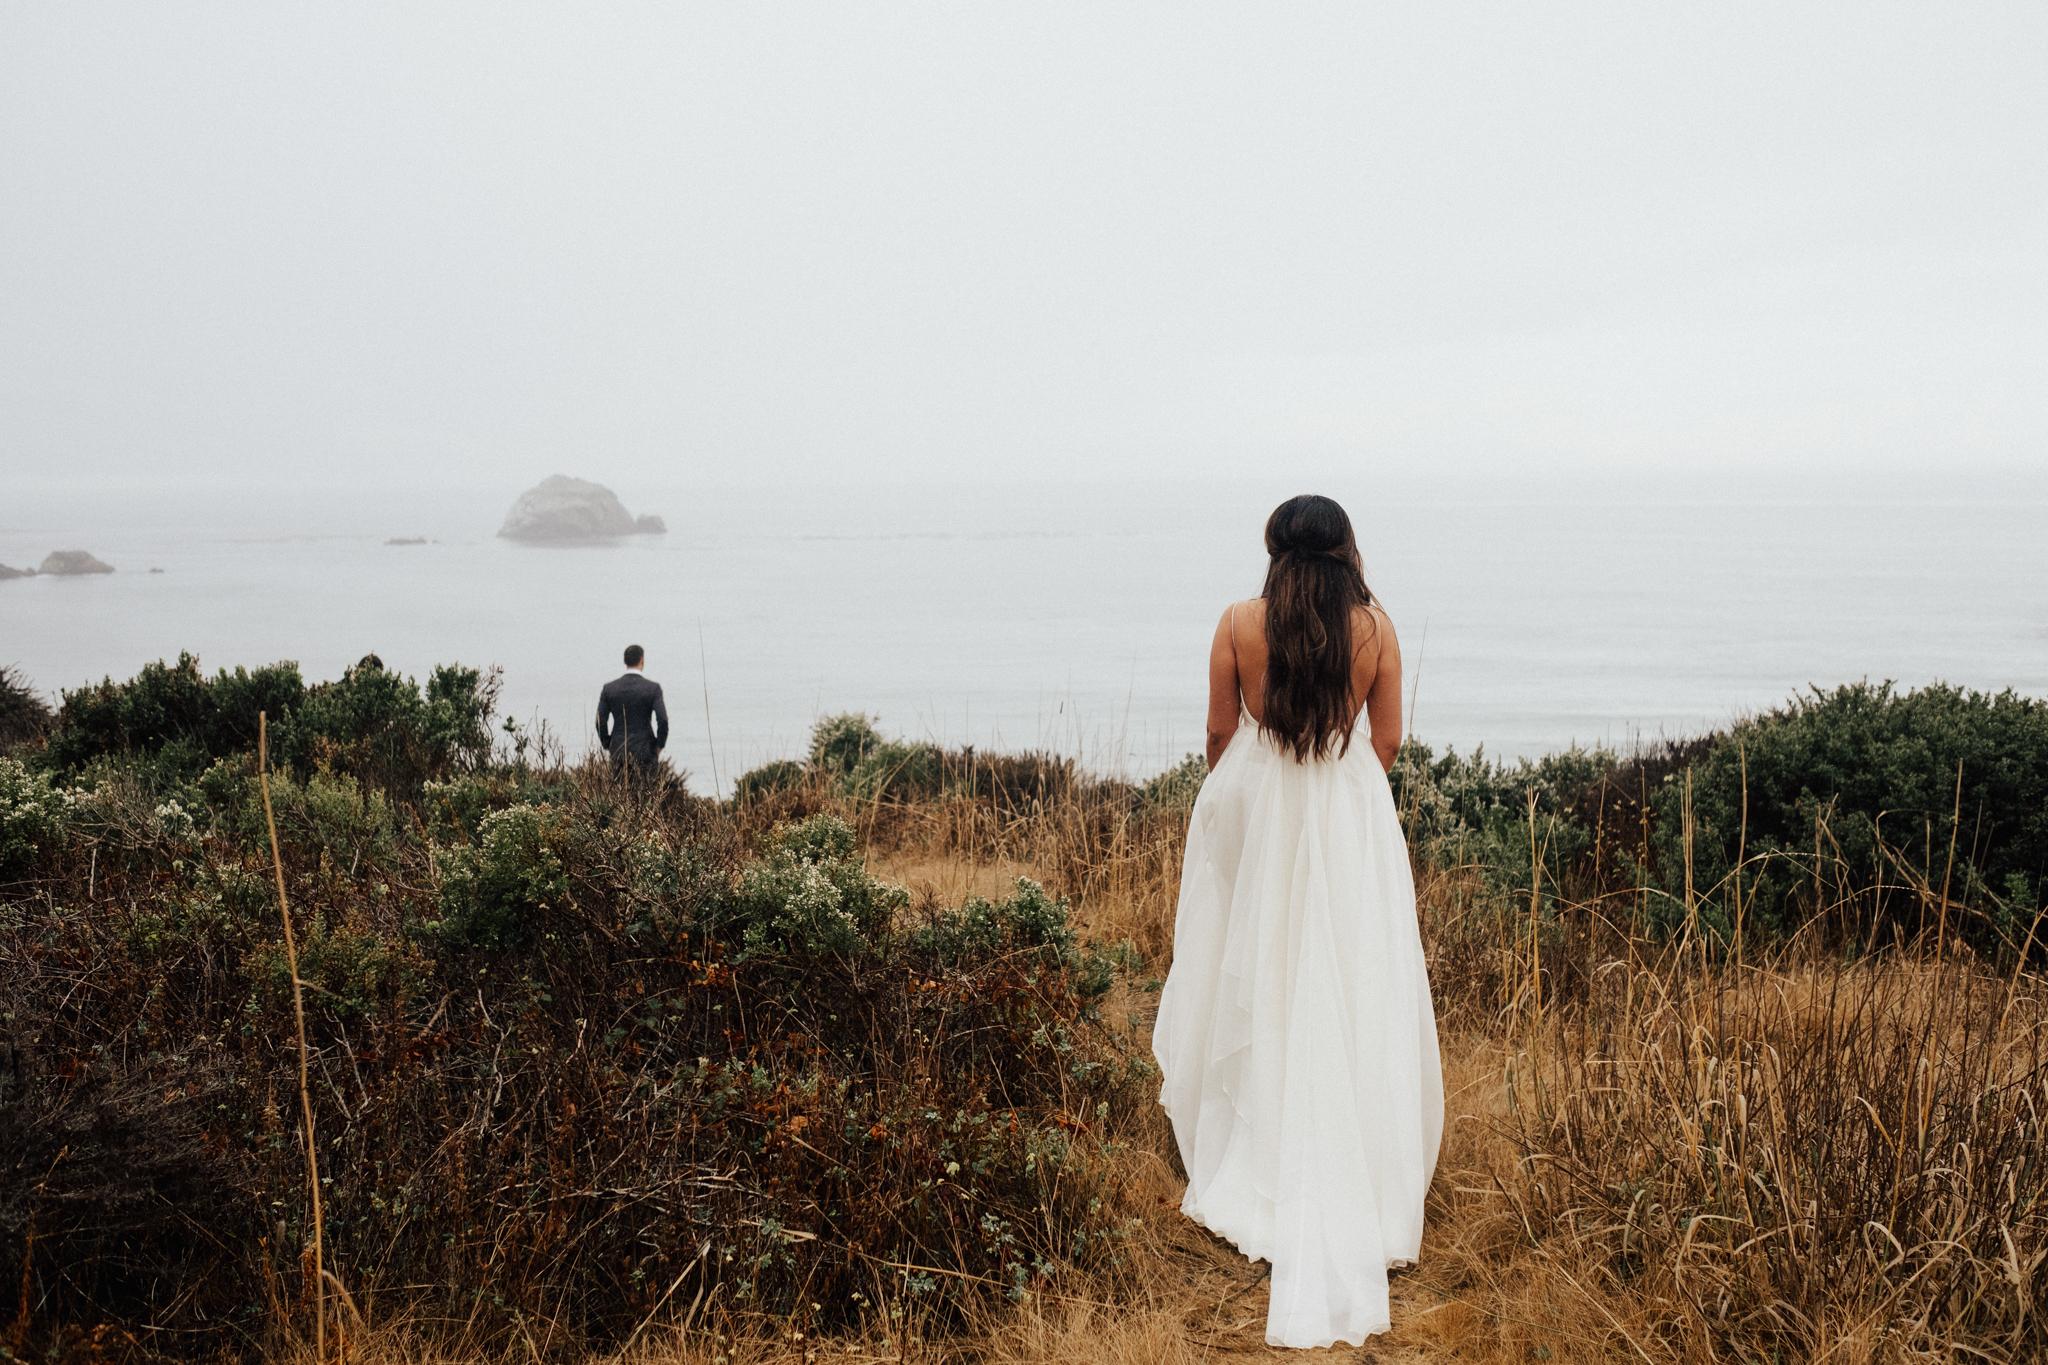 Arizona-Adventure-Elopement-Wedding-Photographer-110.jpg